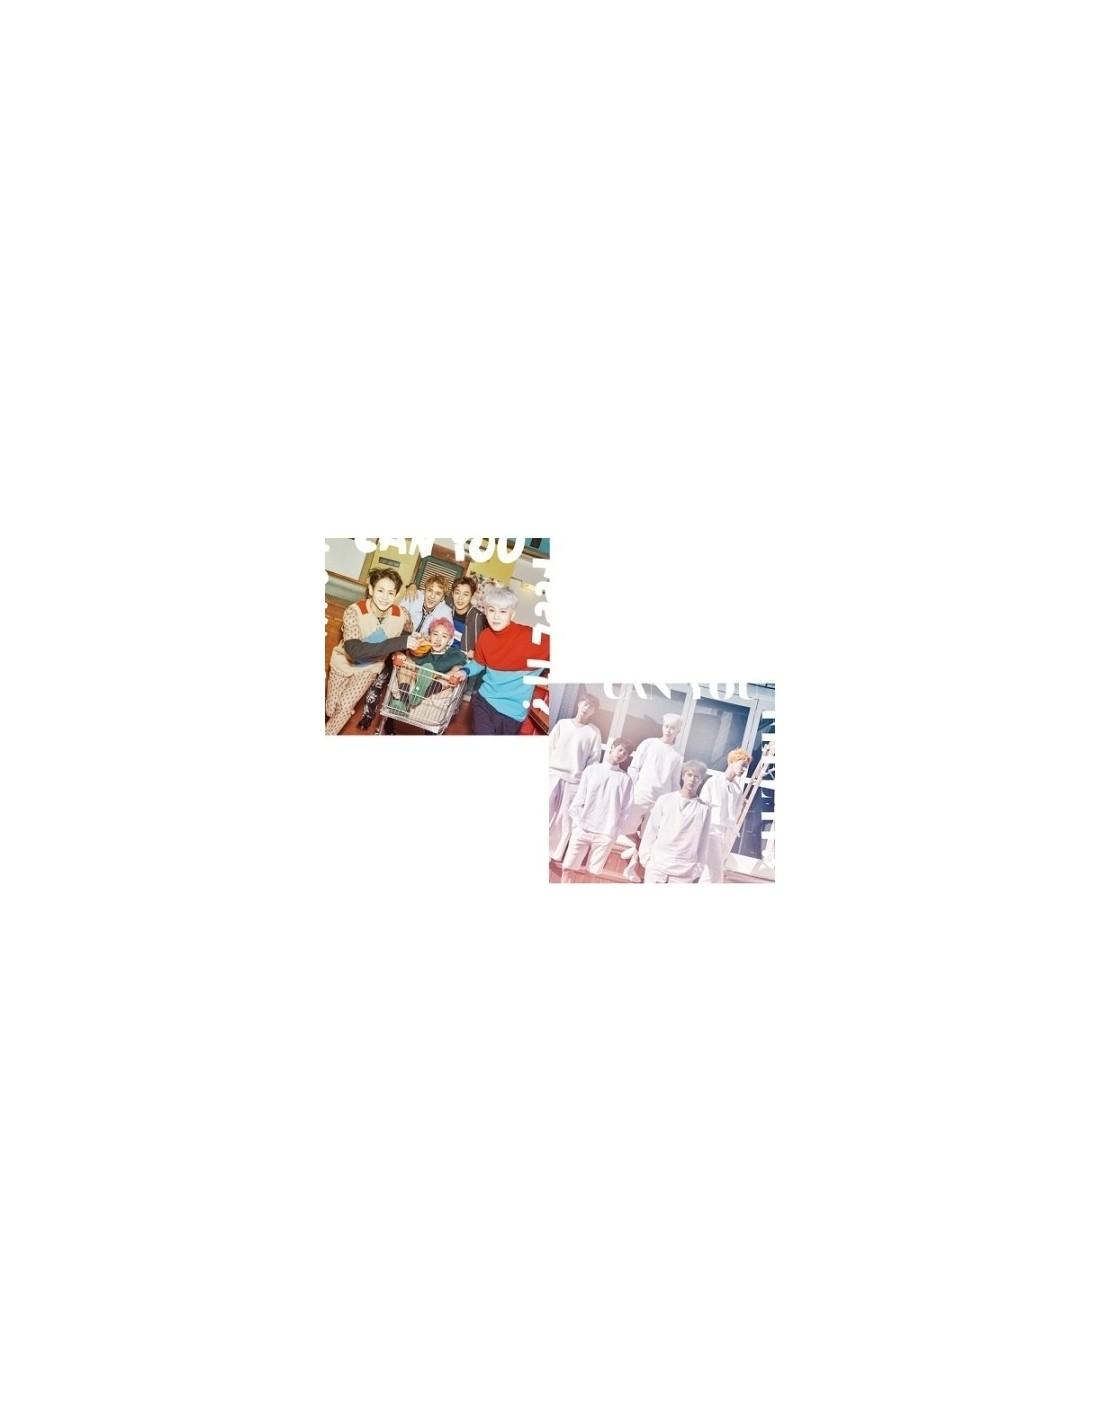 Set Highlight 1st Mini Album